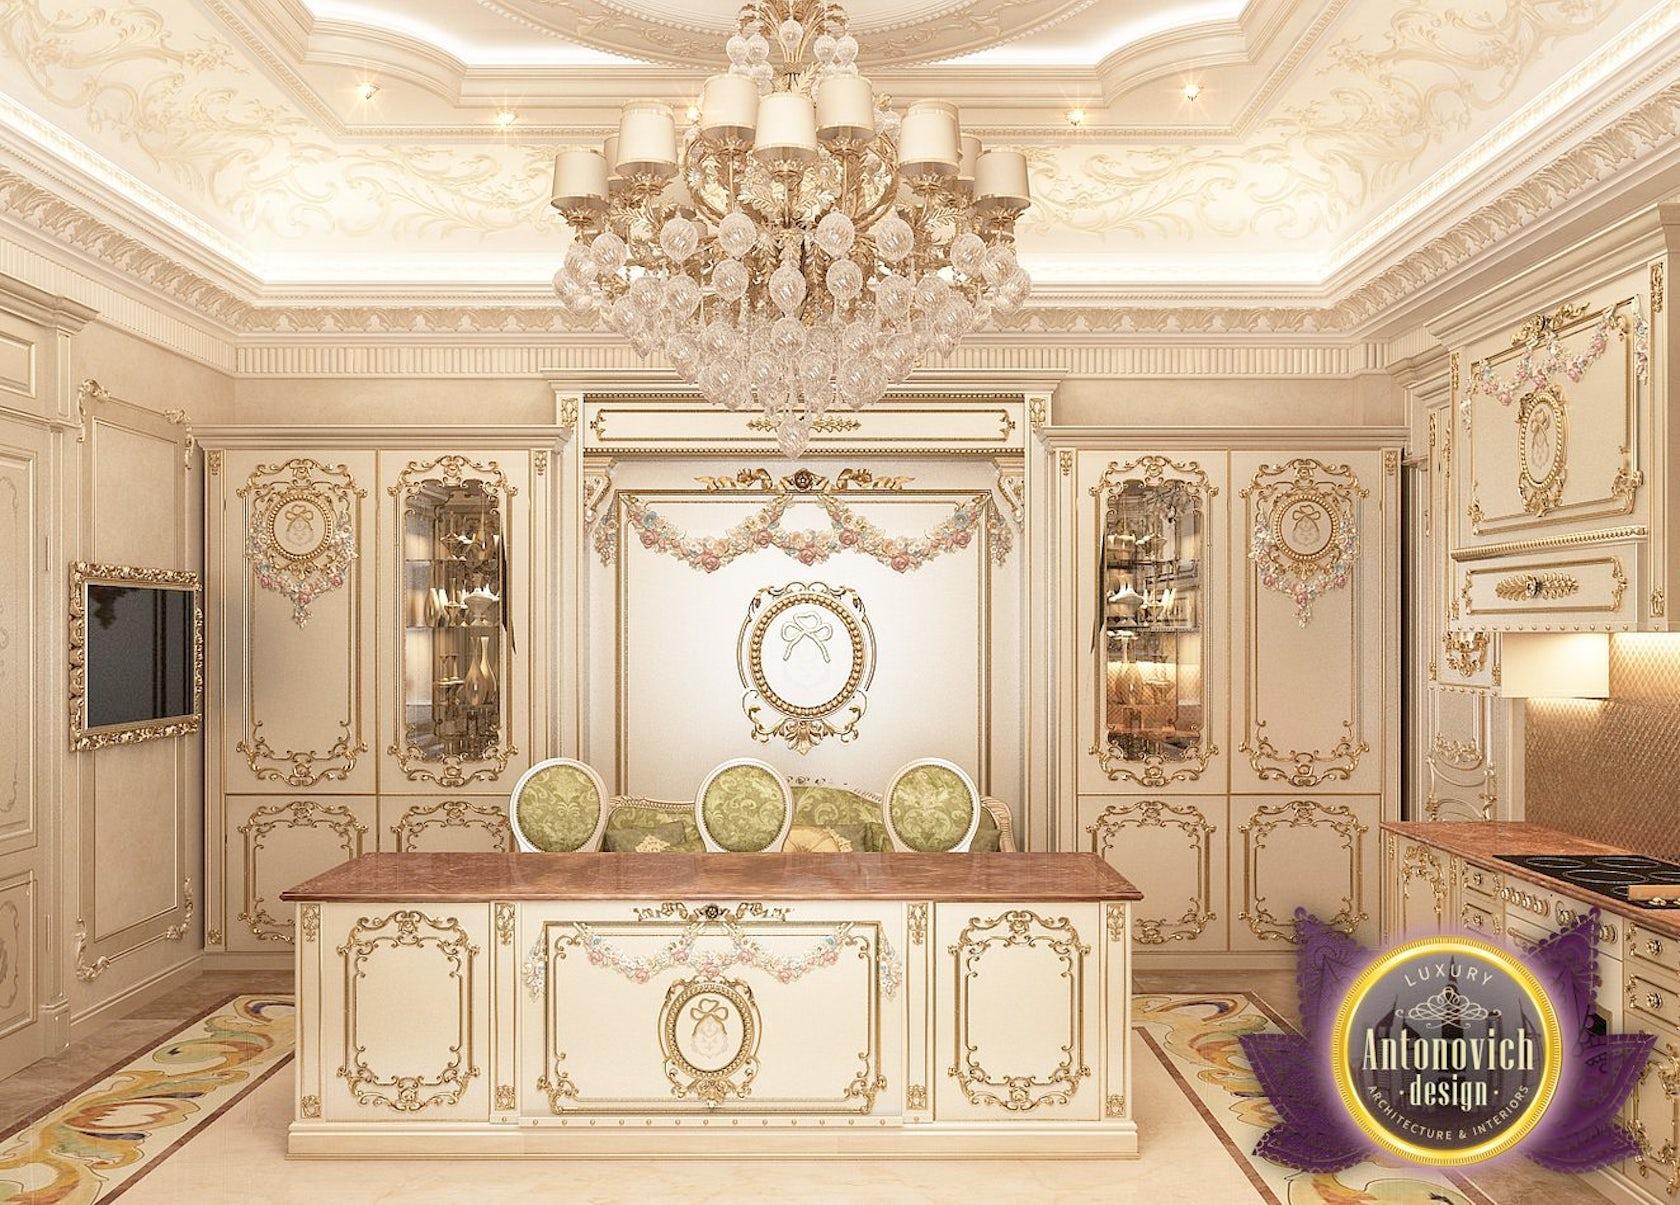 Kitchen Design Usa By Katrina Antonovich: Kitchen Design From Luxury Antonovich Design